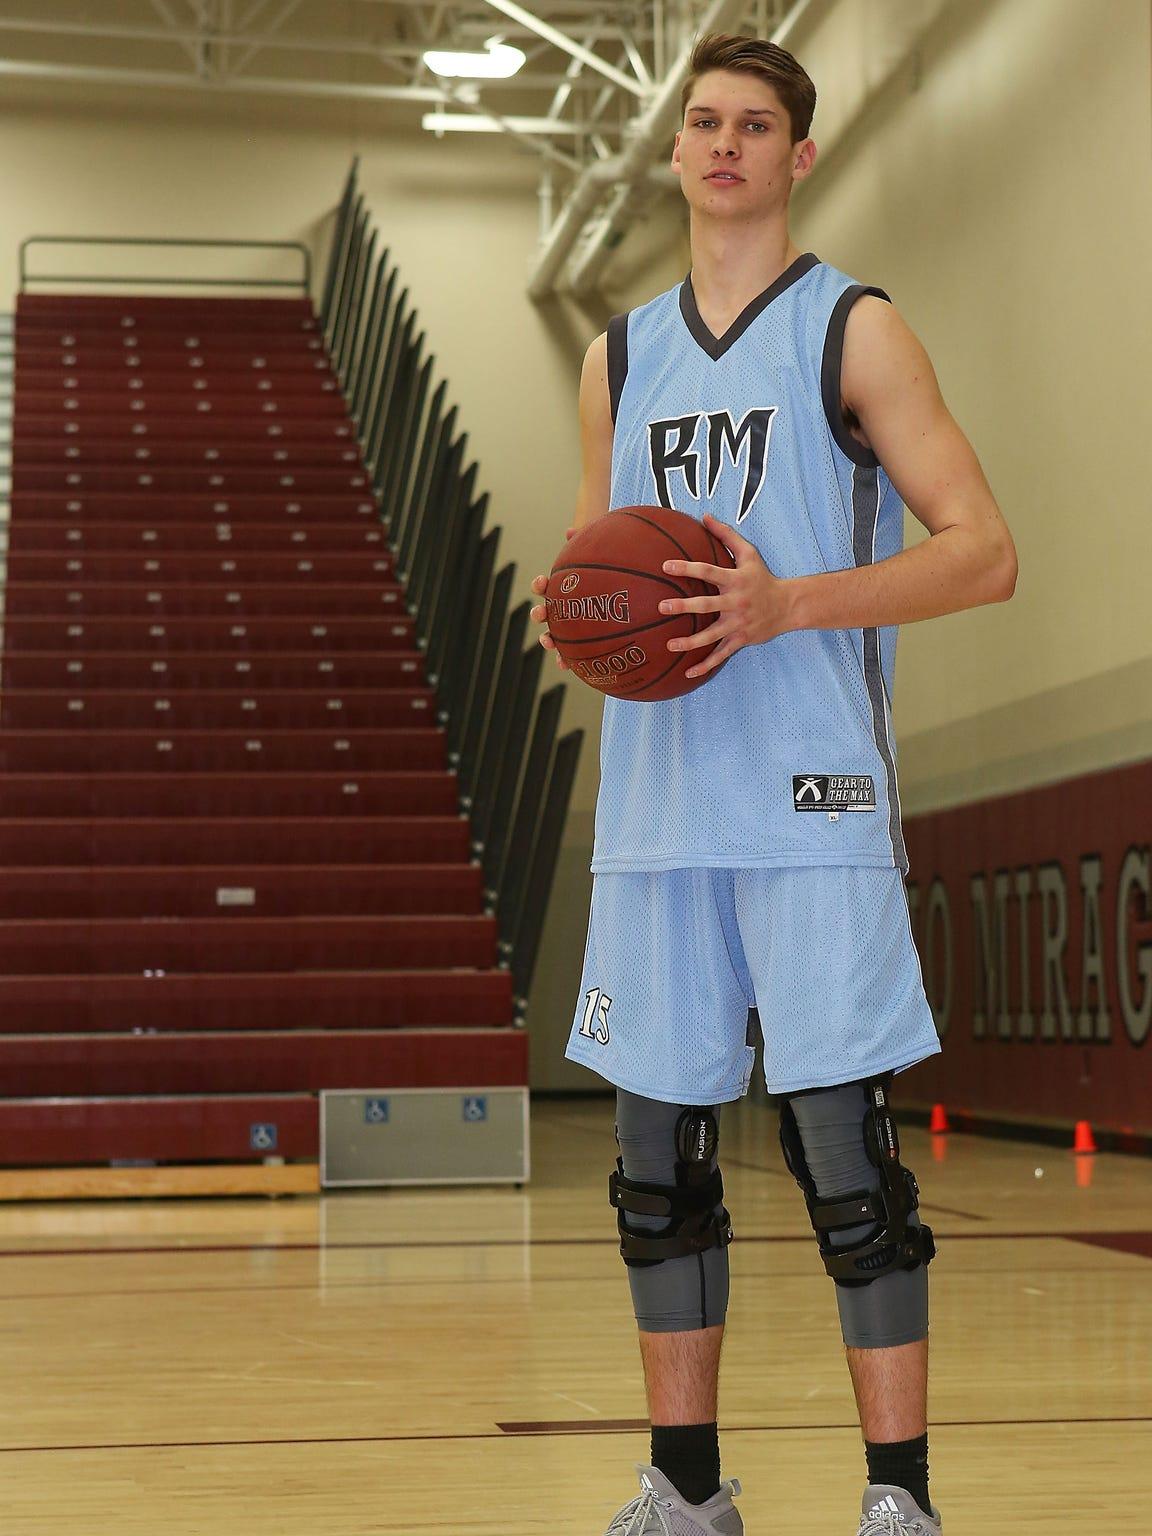 Rancho Mirage High School basketball player Bryan Talley